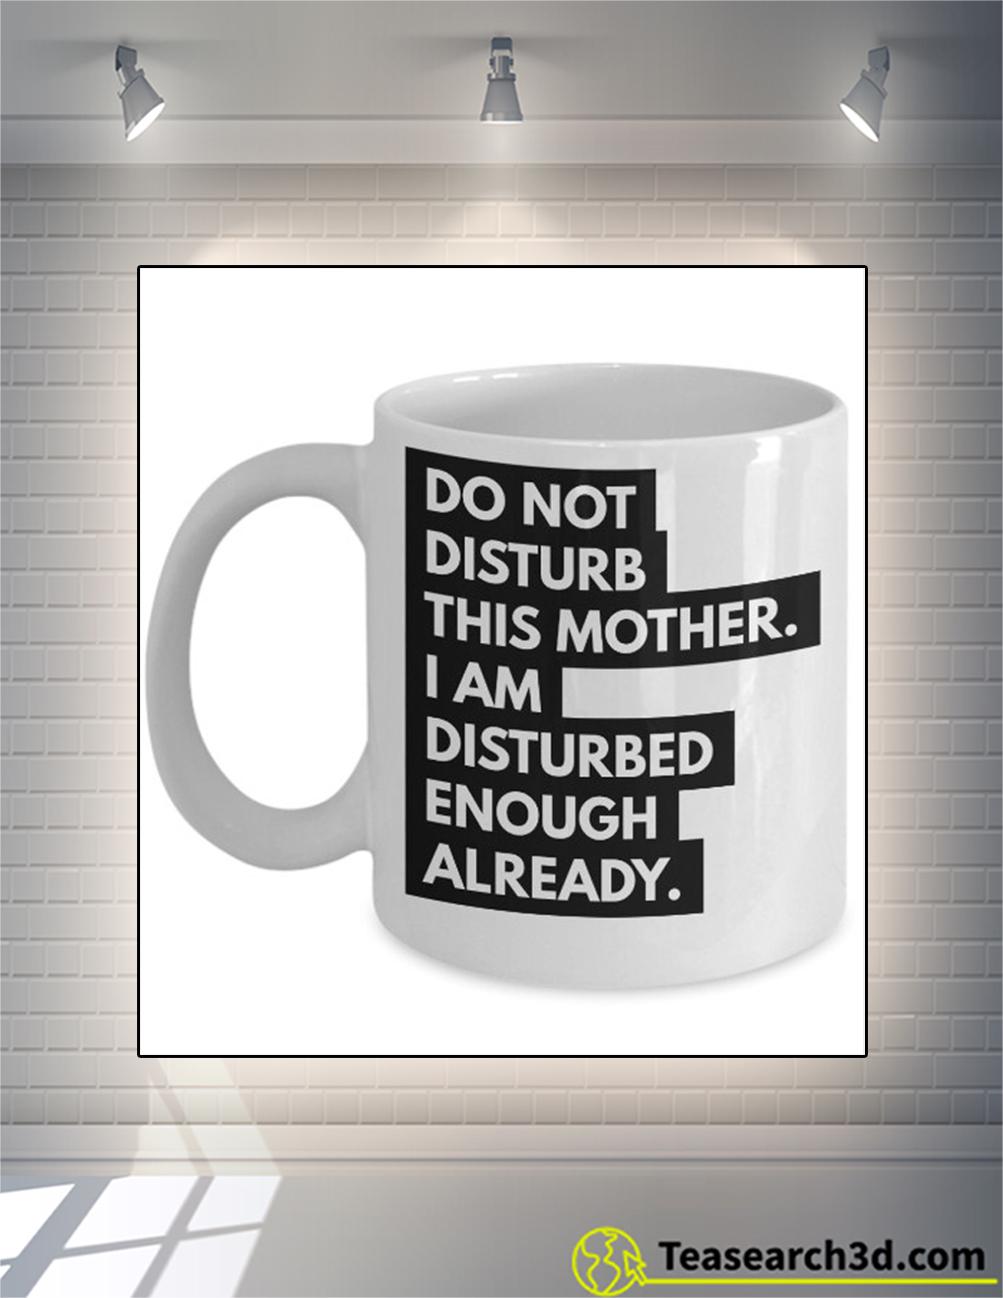 Do not disturb this mother mug 11oz